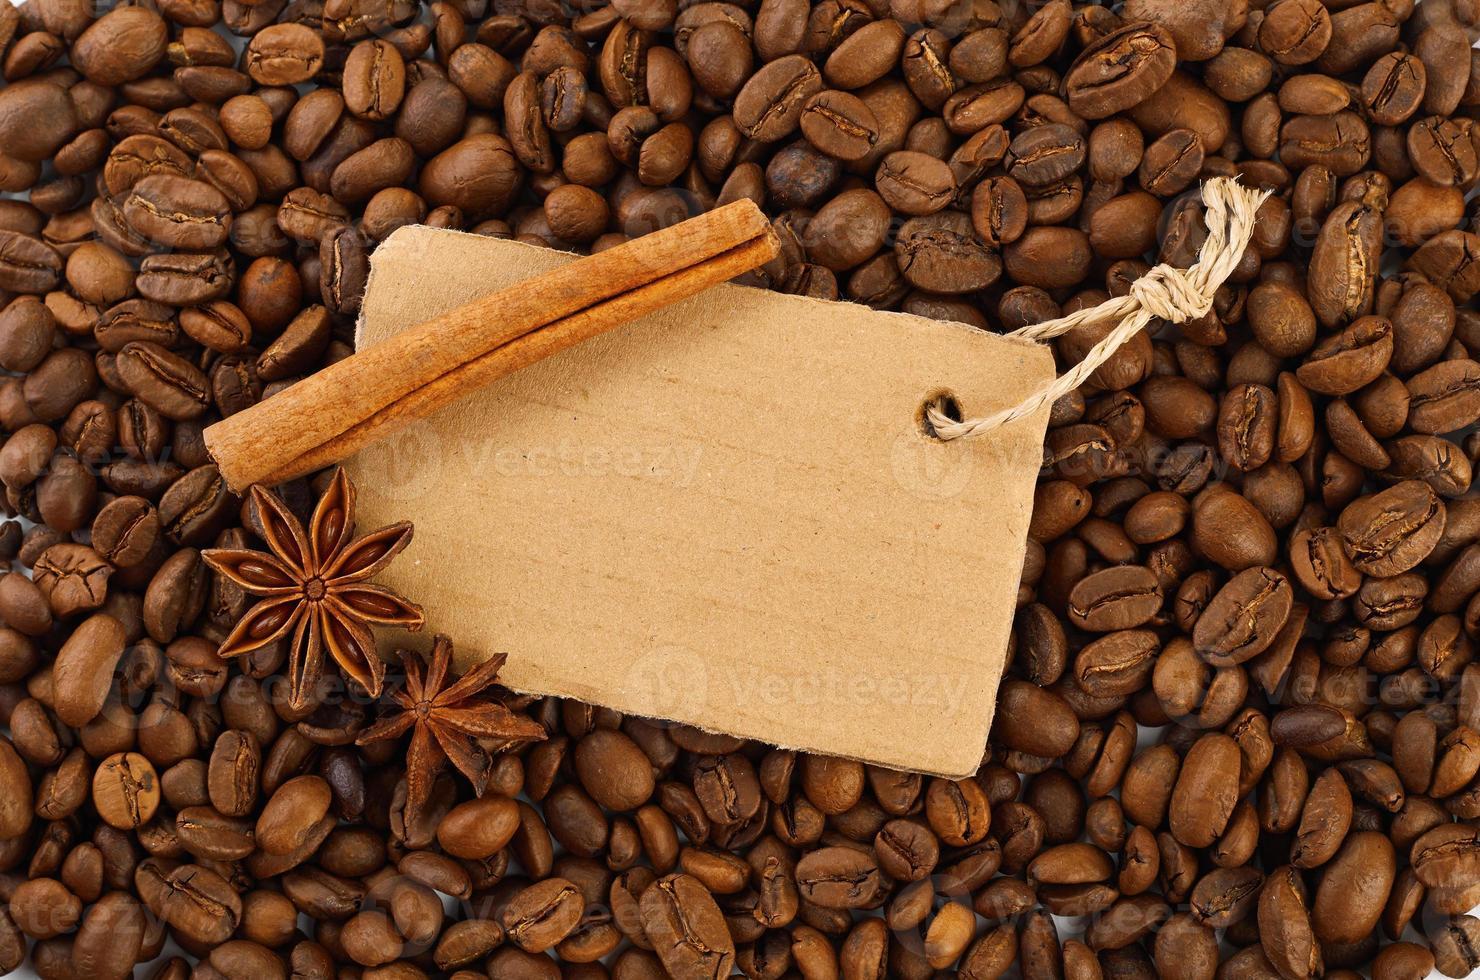 Kaffee und leer foto